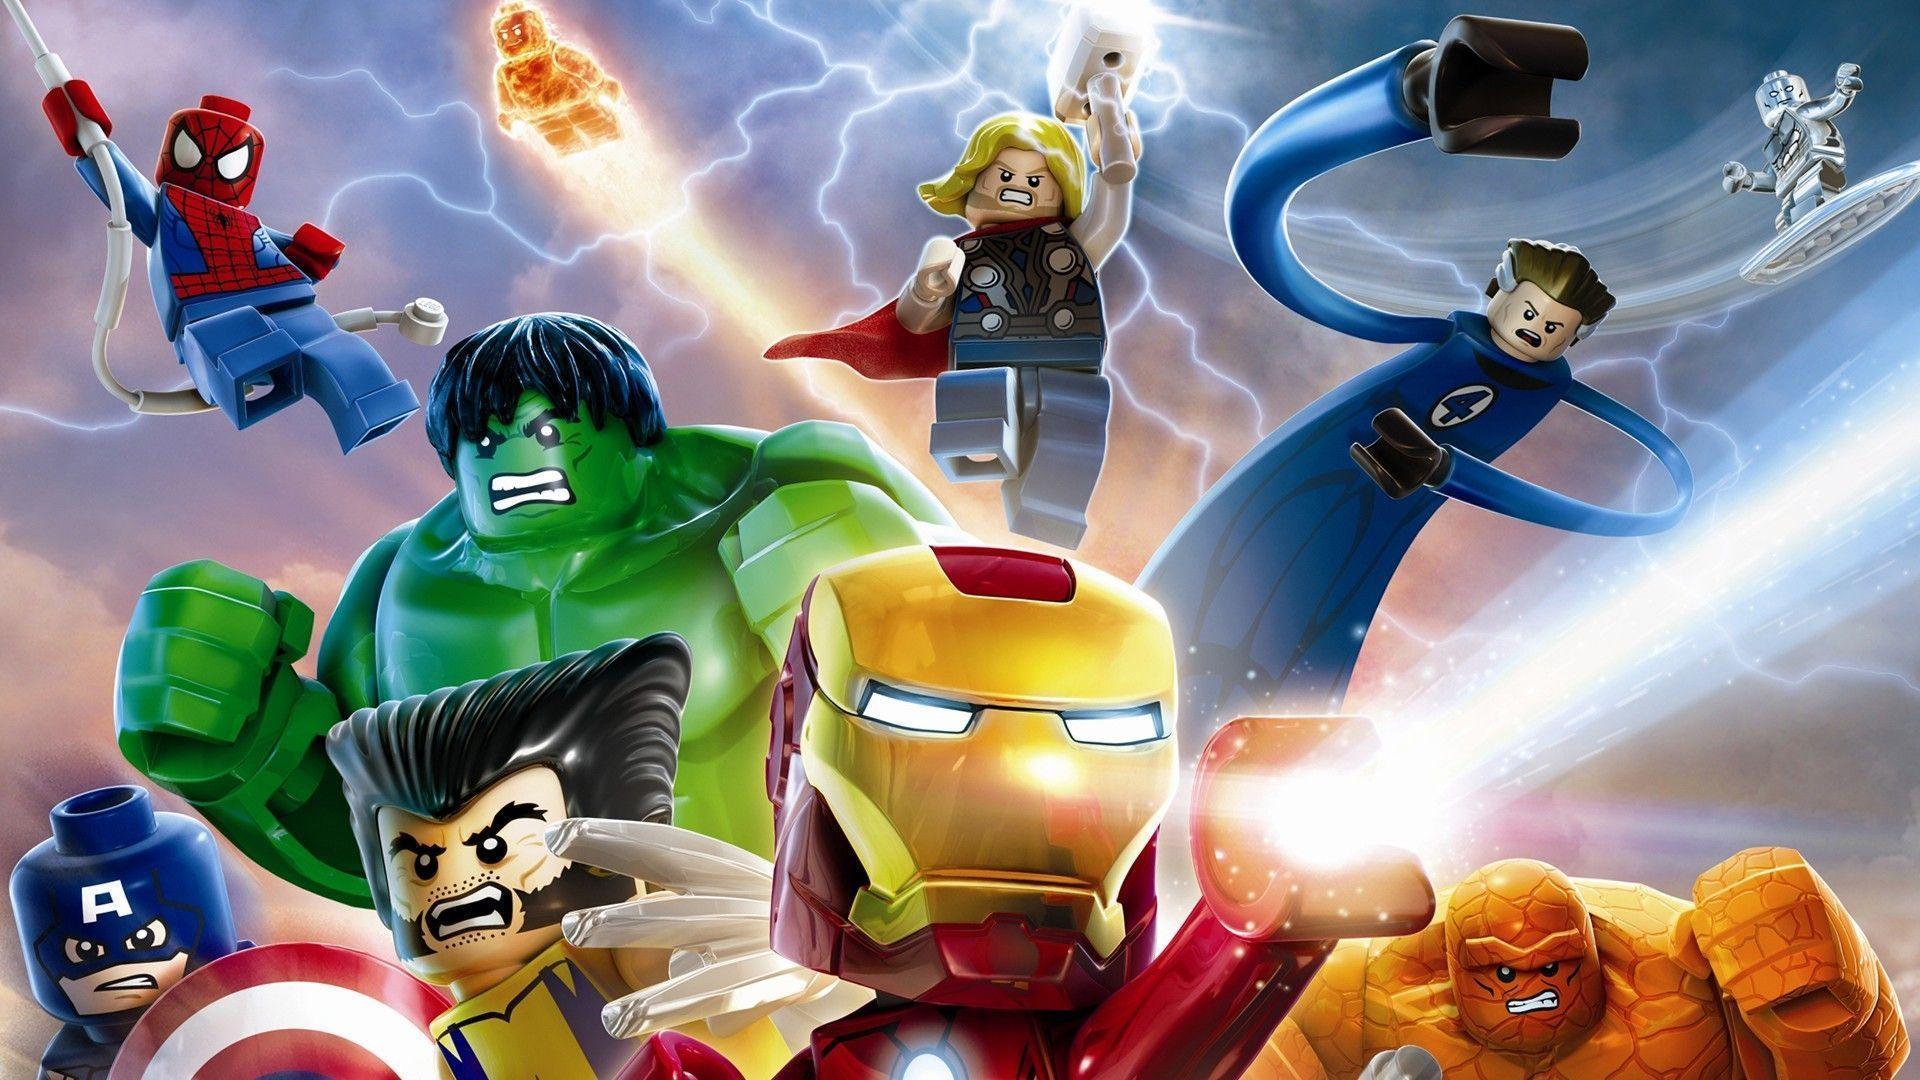 17 Lego Marvel Super Heroes Wallpapers | Lego Marvel Super Heroes .